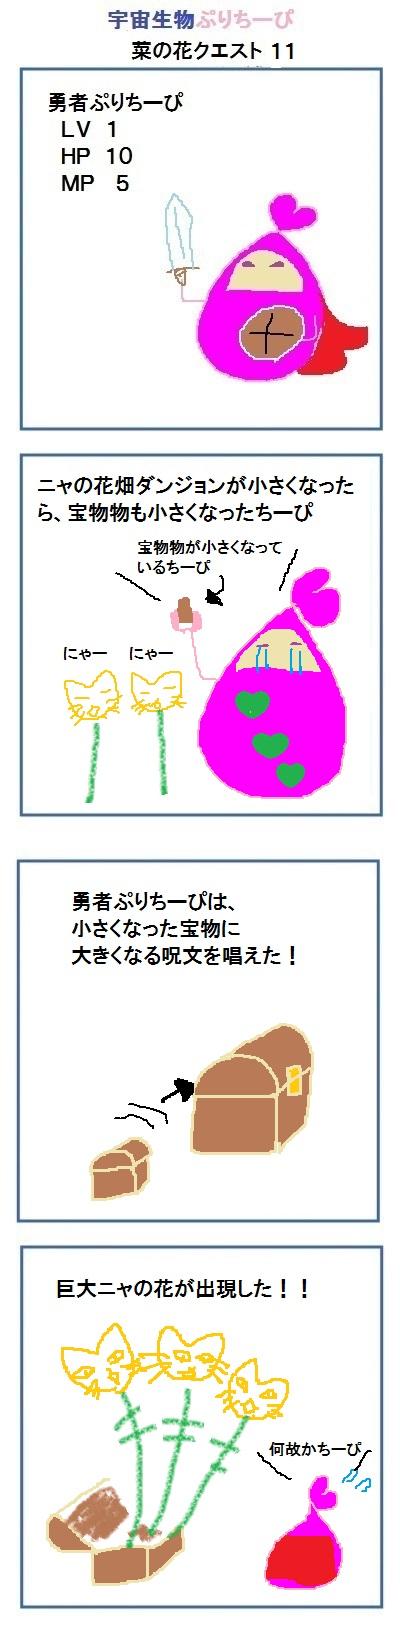 20160322002200e10.jpg